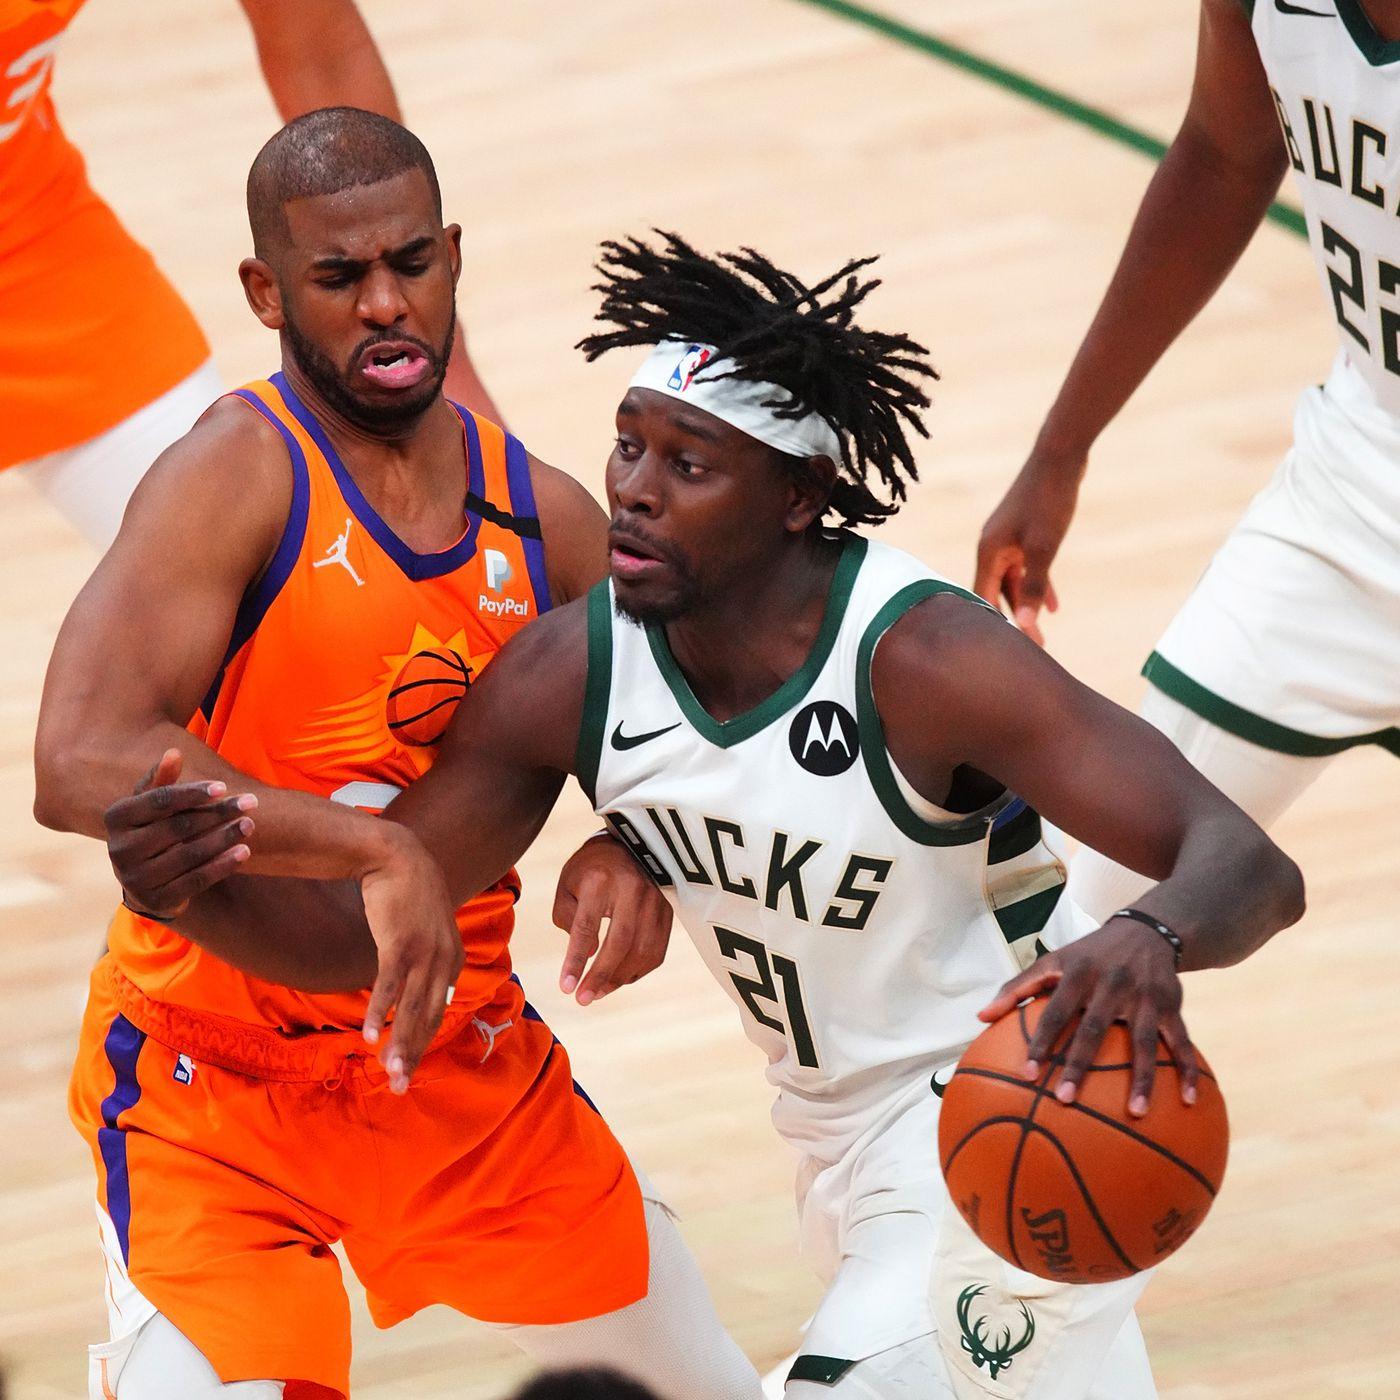 [20-21] NBA冠軍賽:Jrue Holiday經典防守戰、CP3低迷演出、NBA粉絲文化 & more